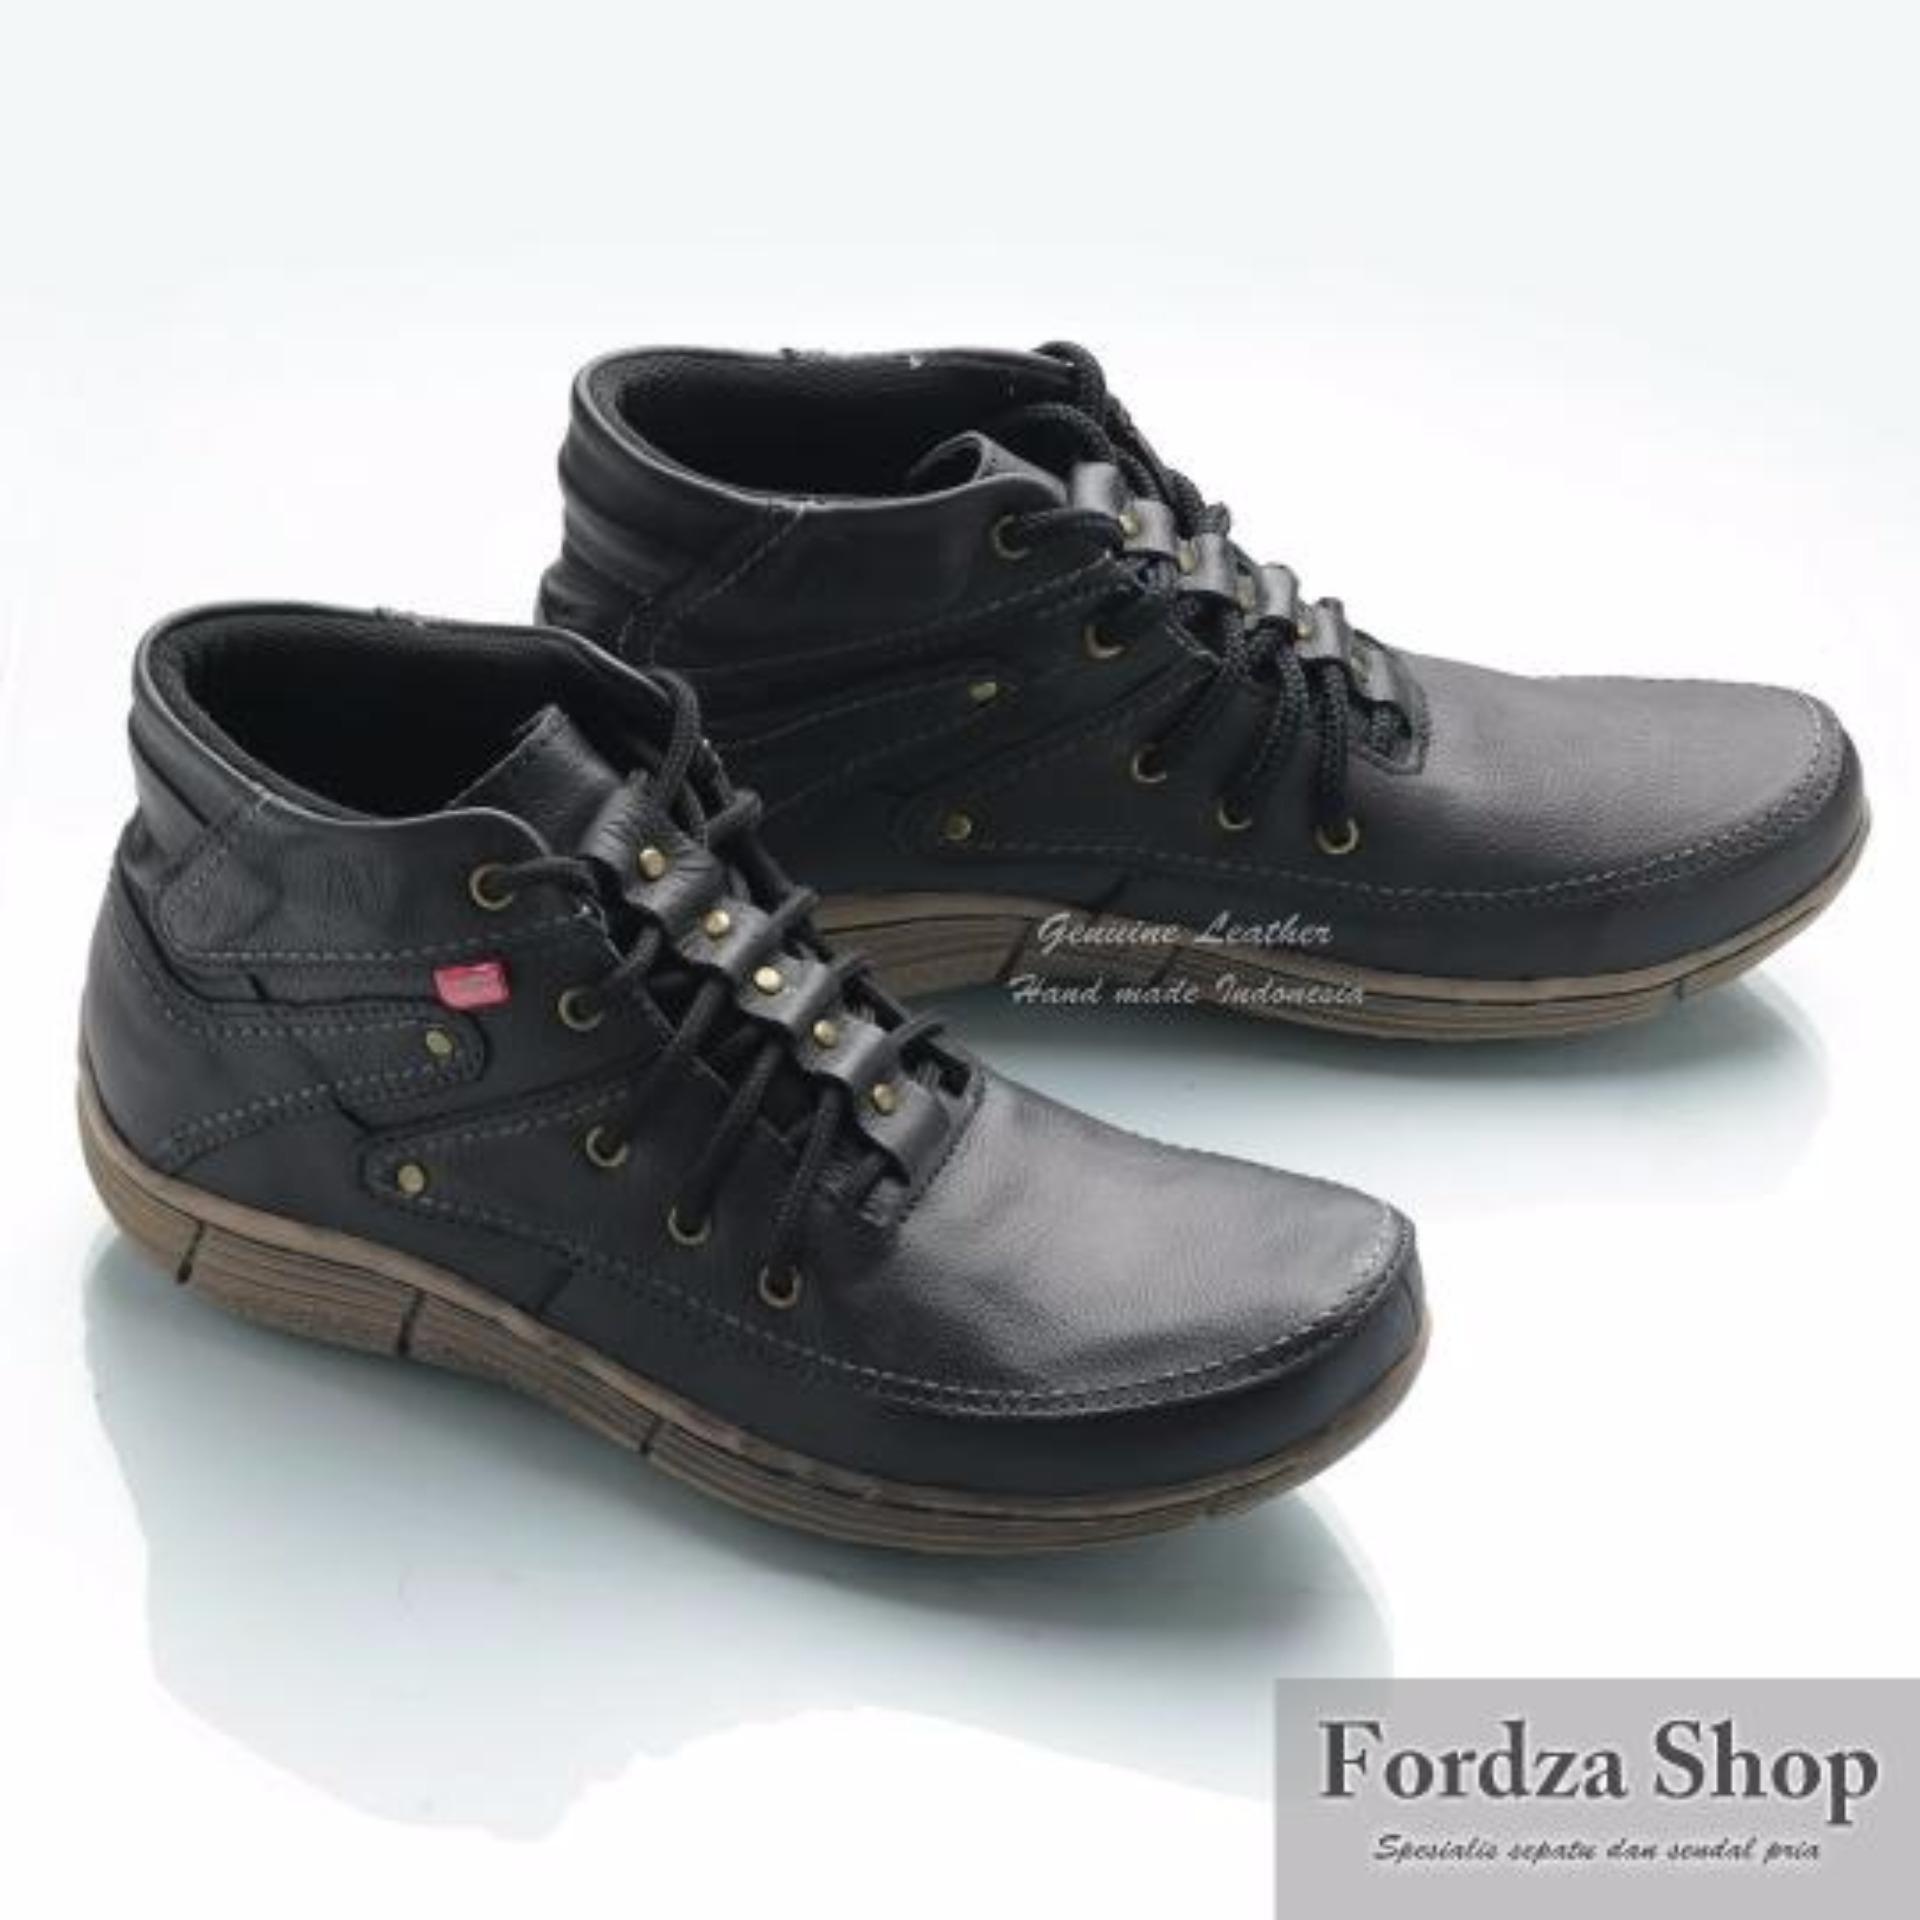 Terbaik Murah Sepatu Boot Kulit Asli Model Kickers BKS01 Belanja murah b18823396e